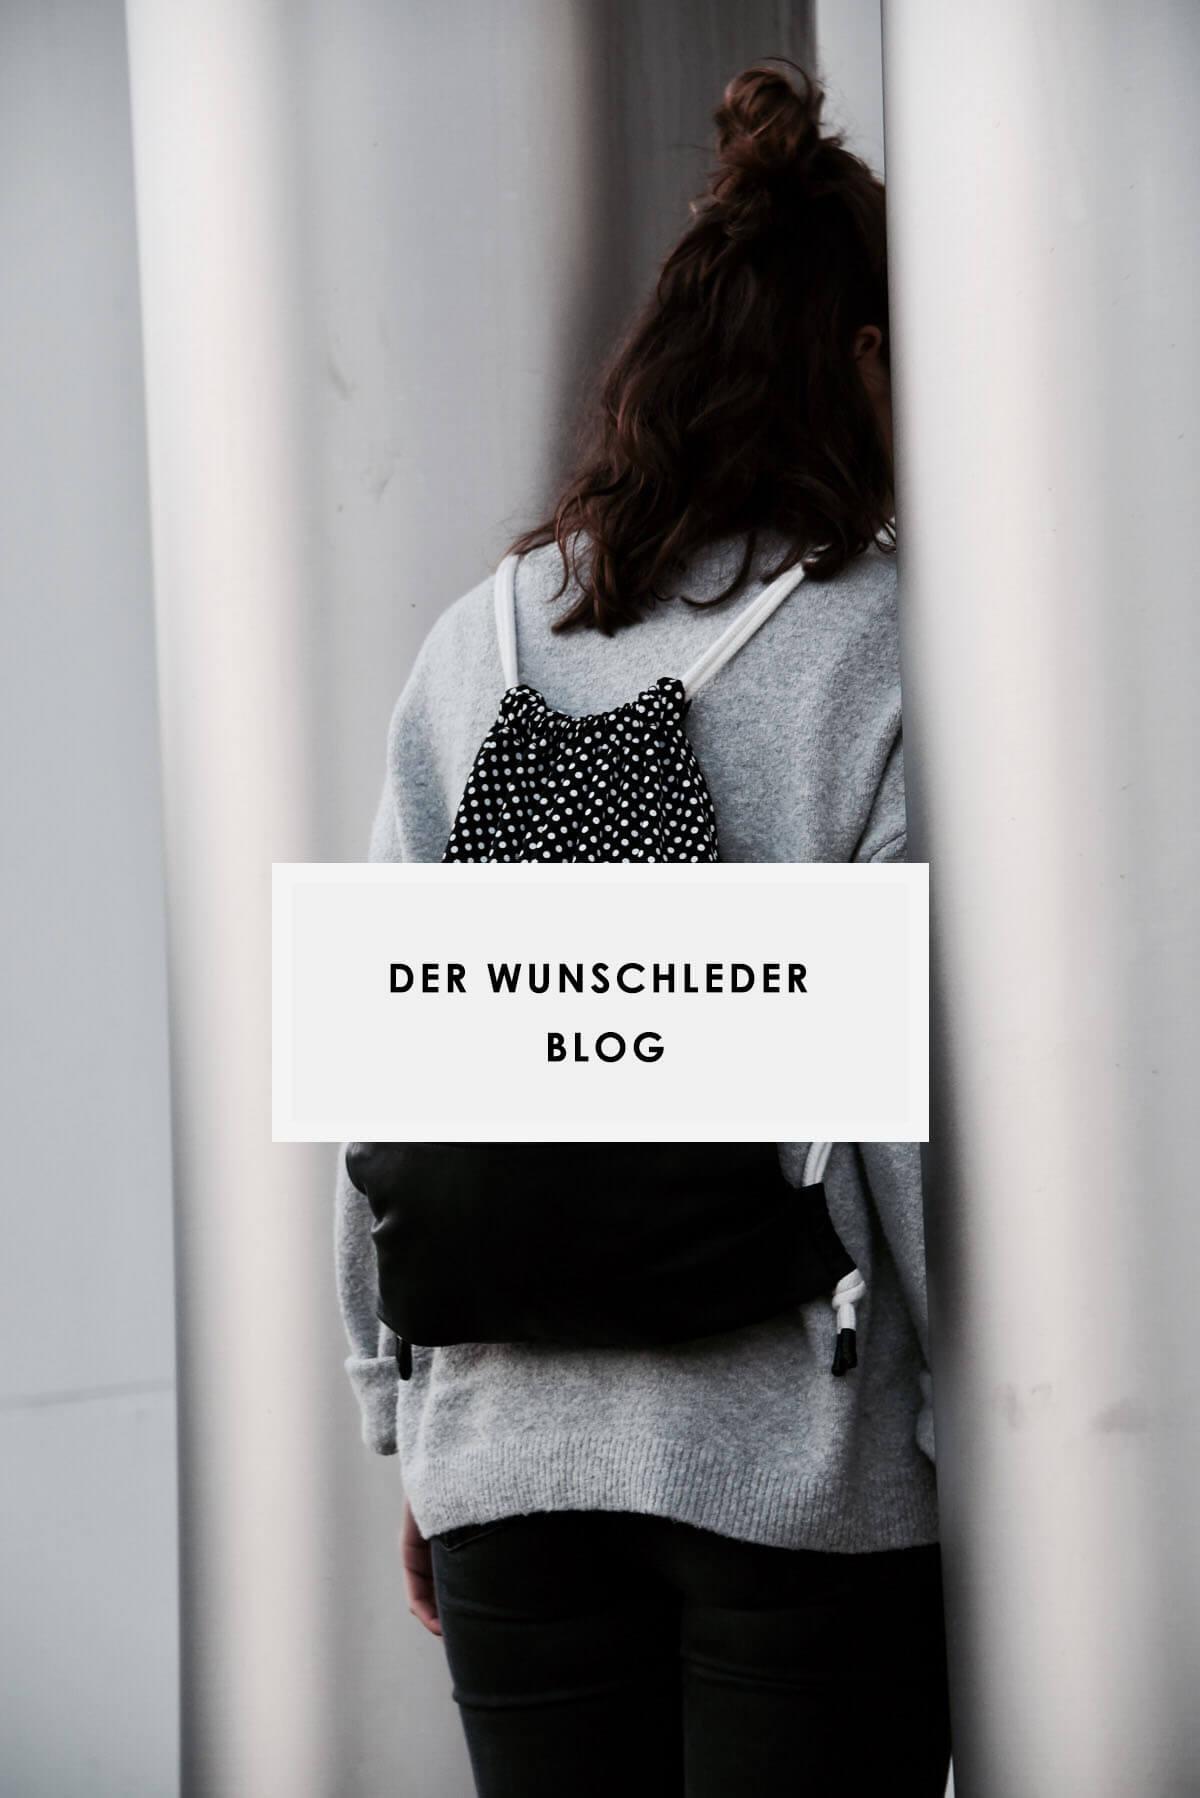 Wunschleder | Blog | Fashion